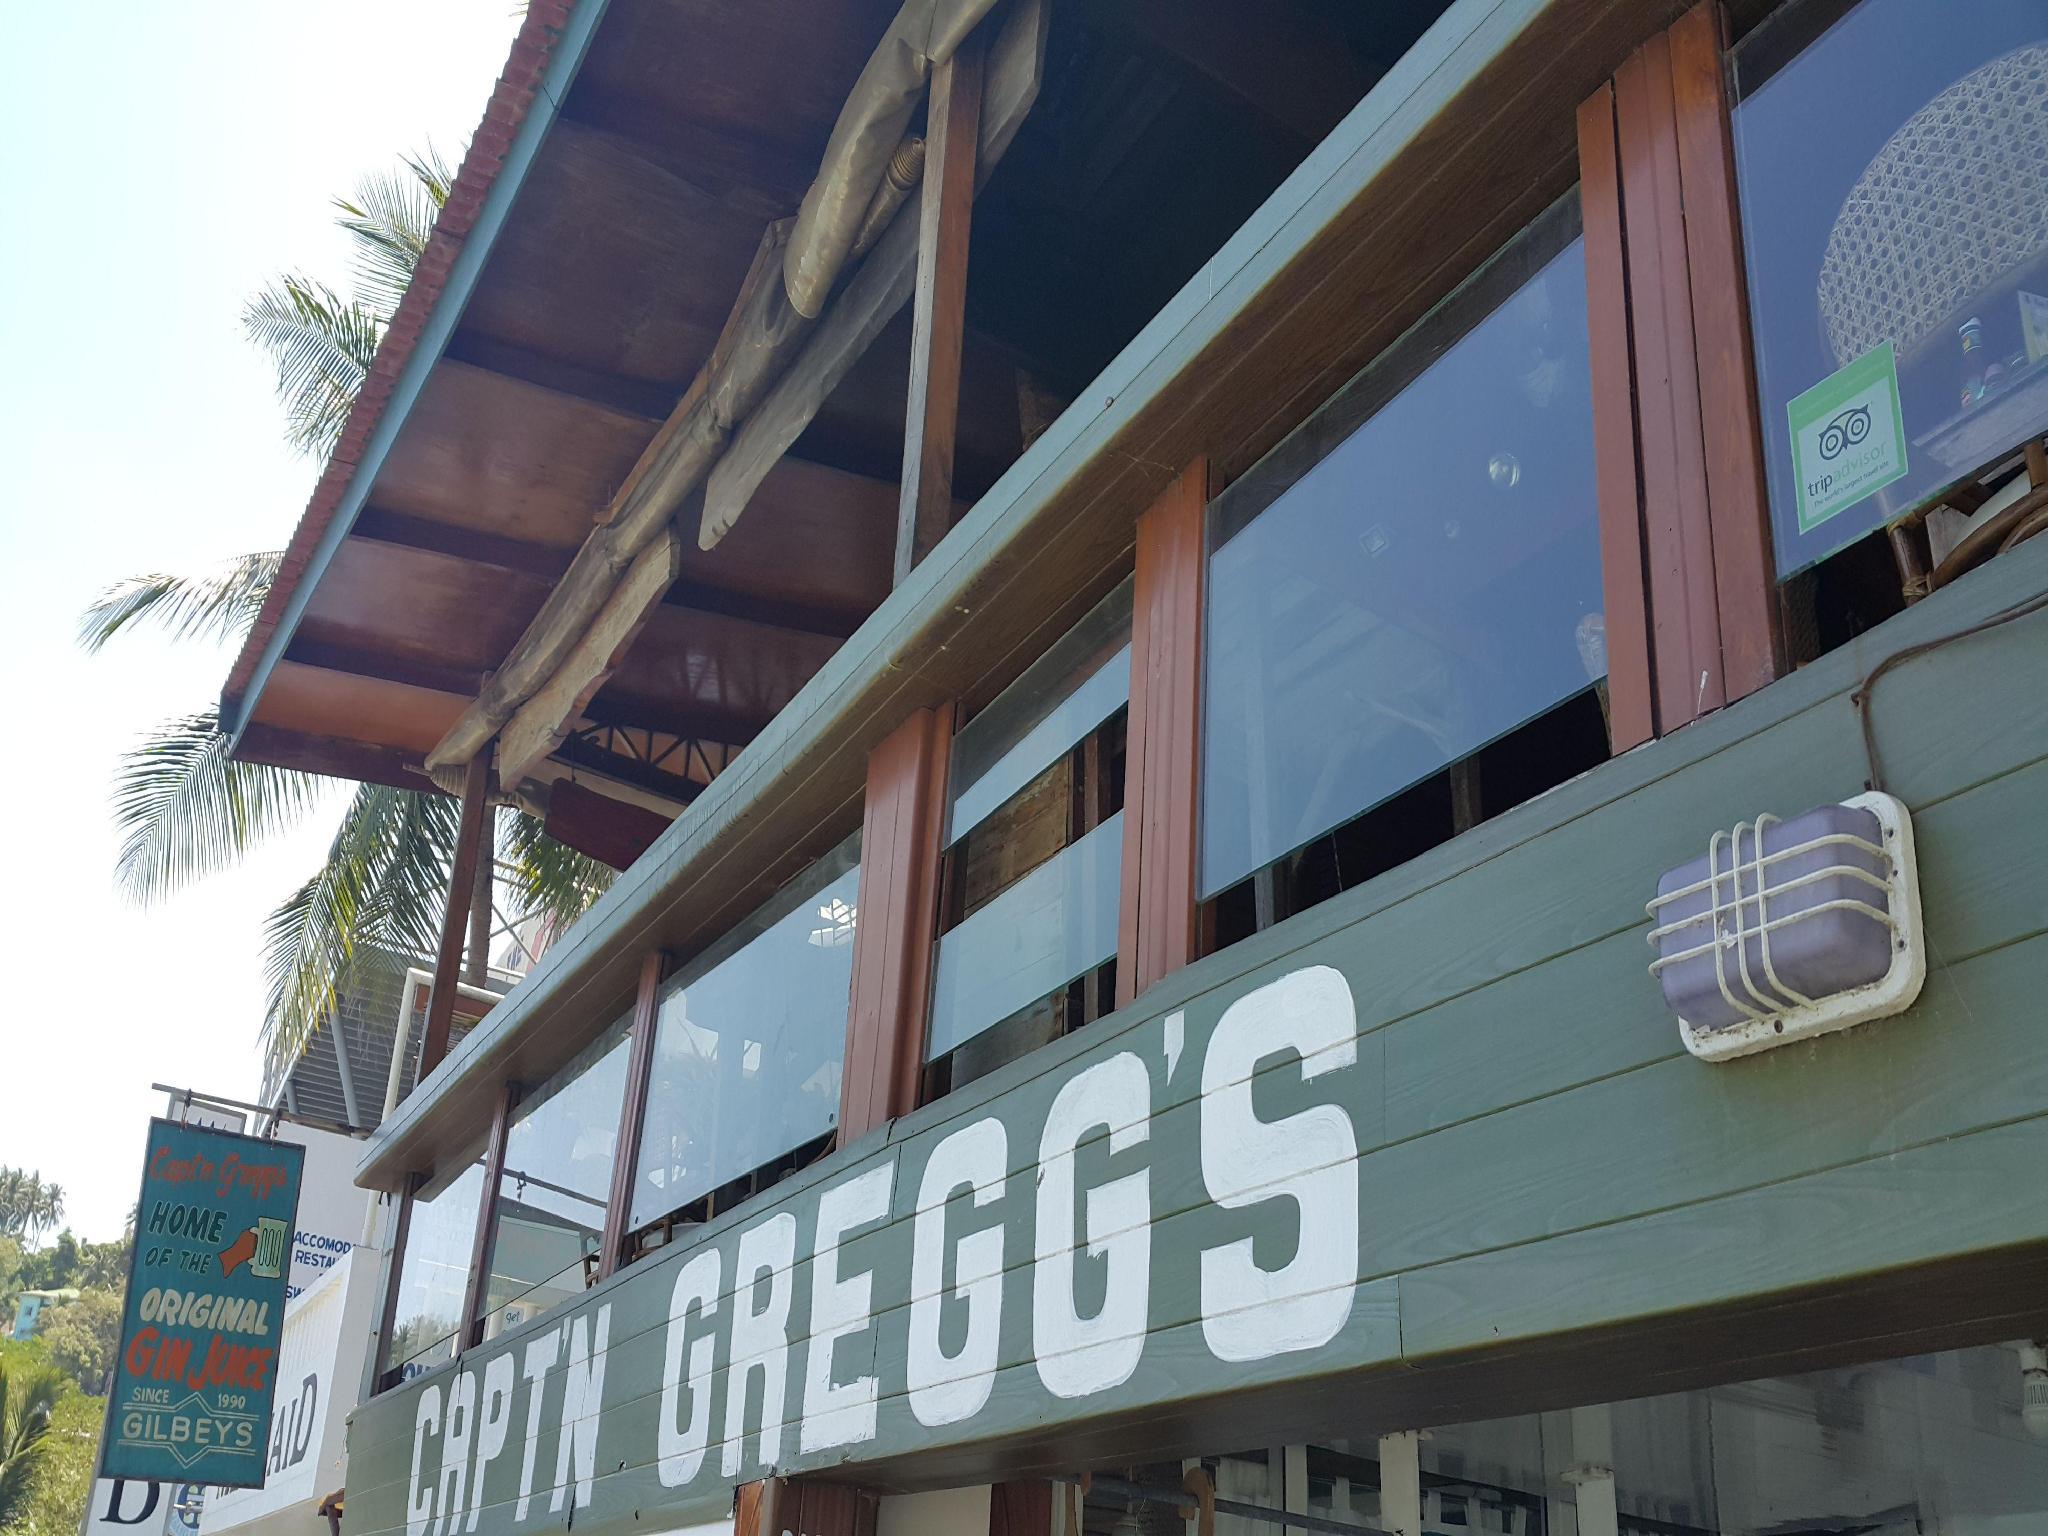 Capt'n Gregg's Dive Resort